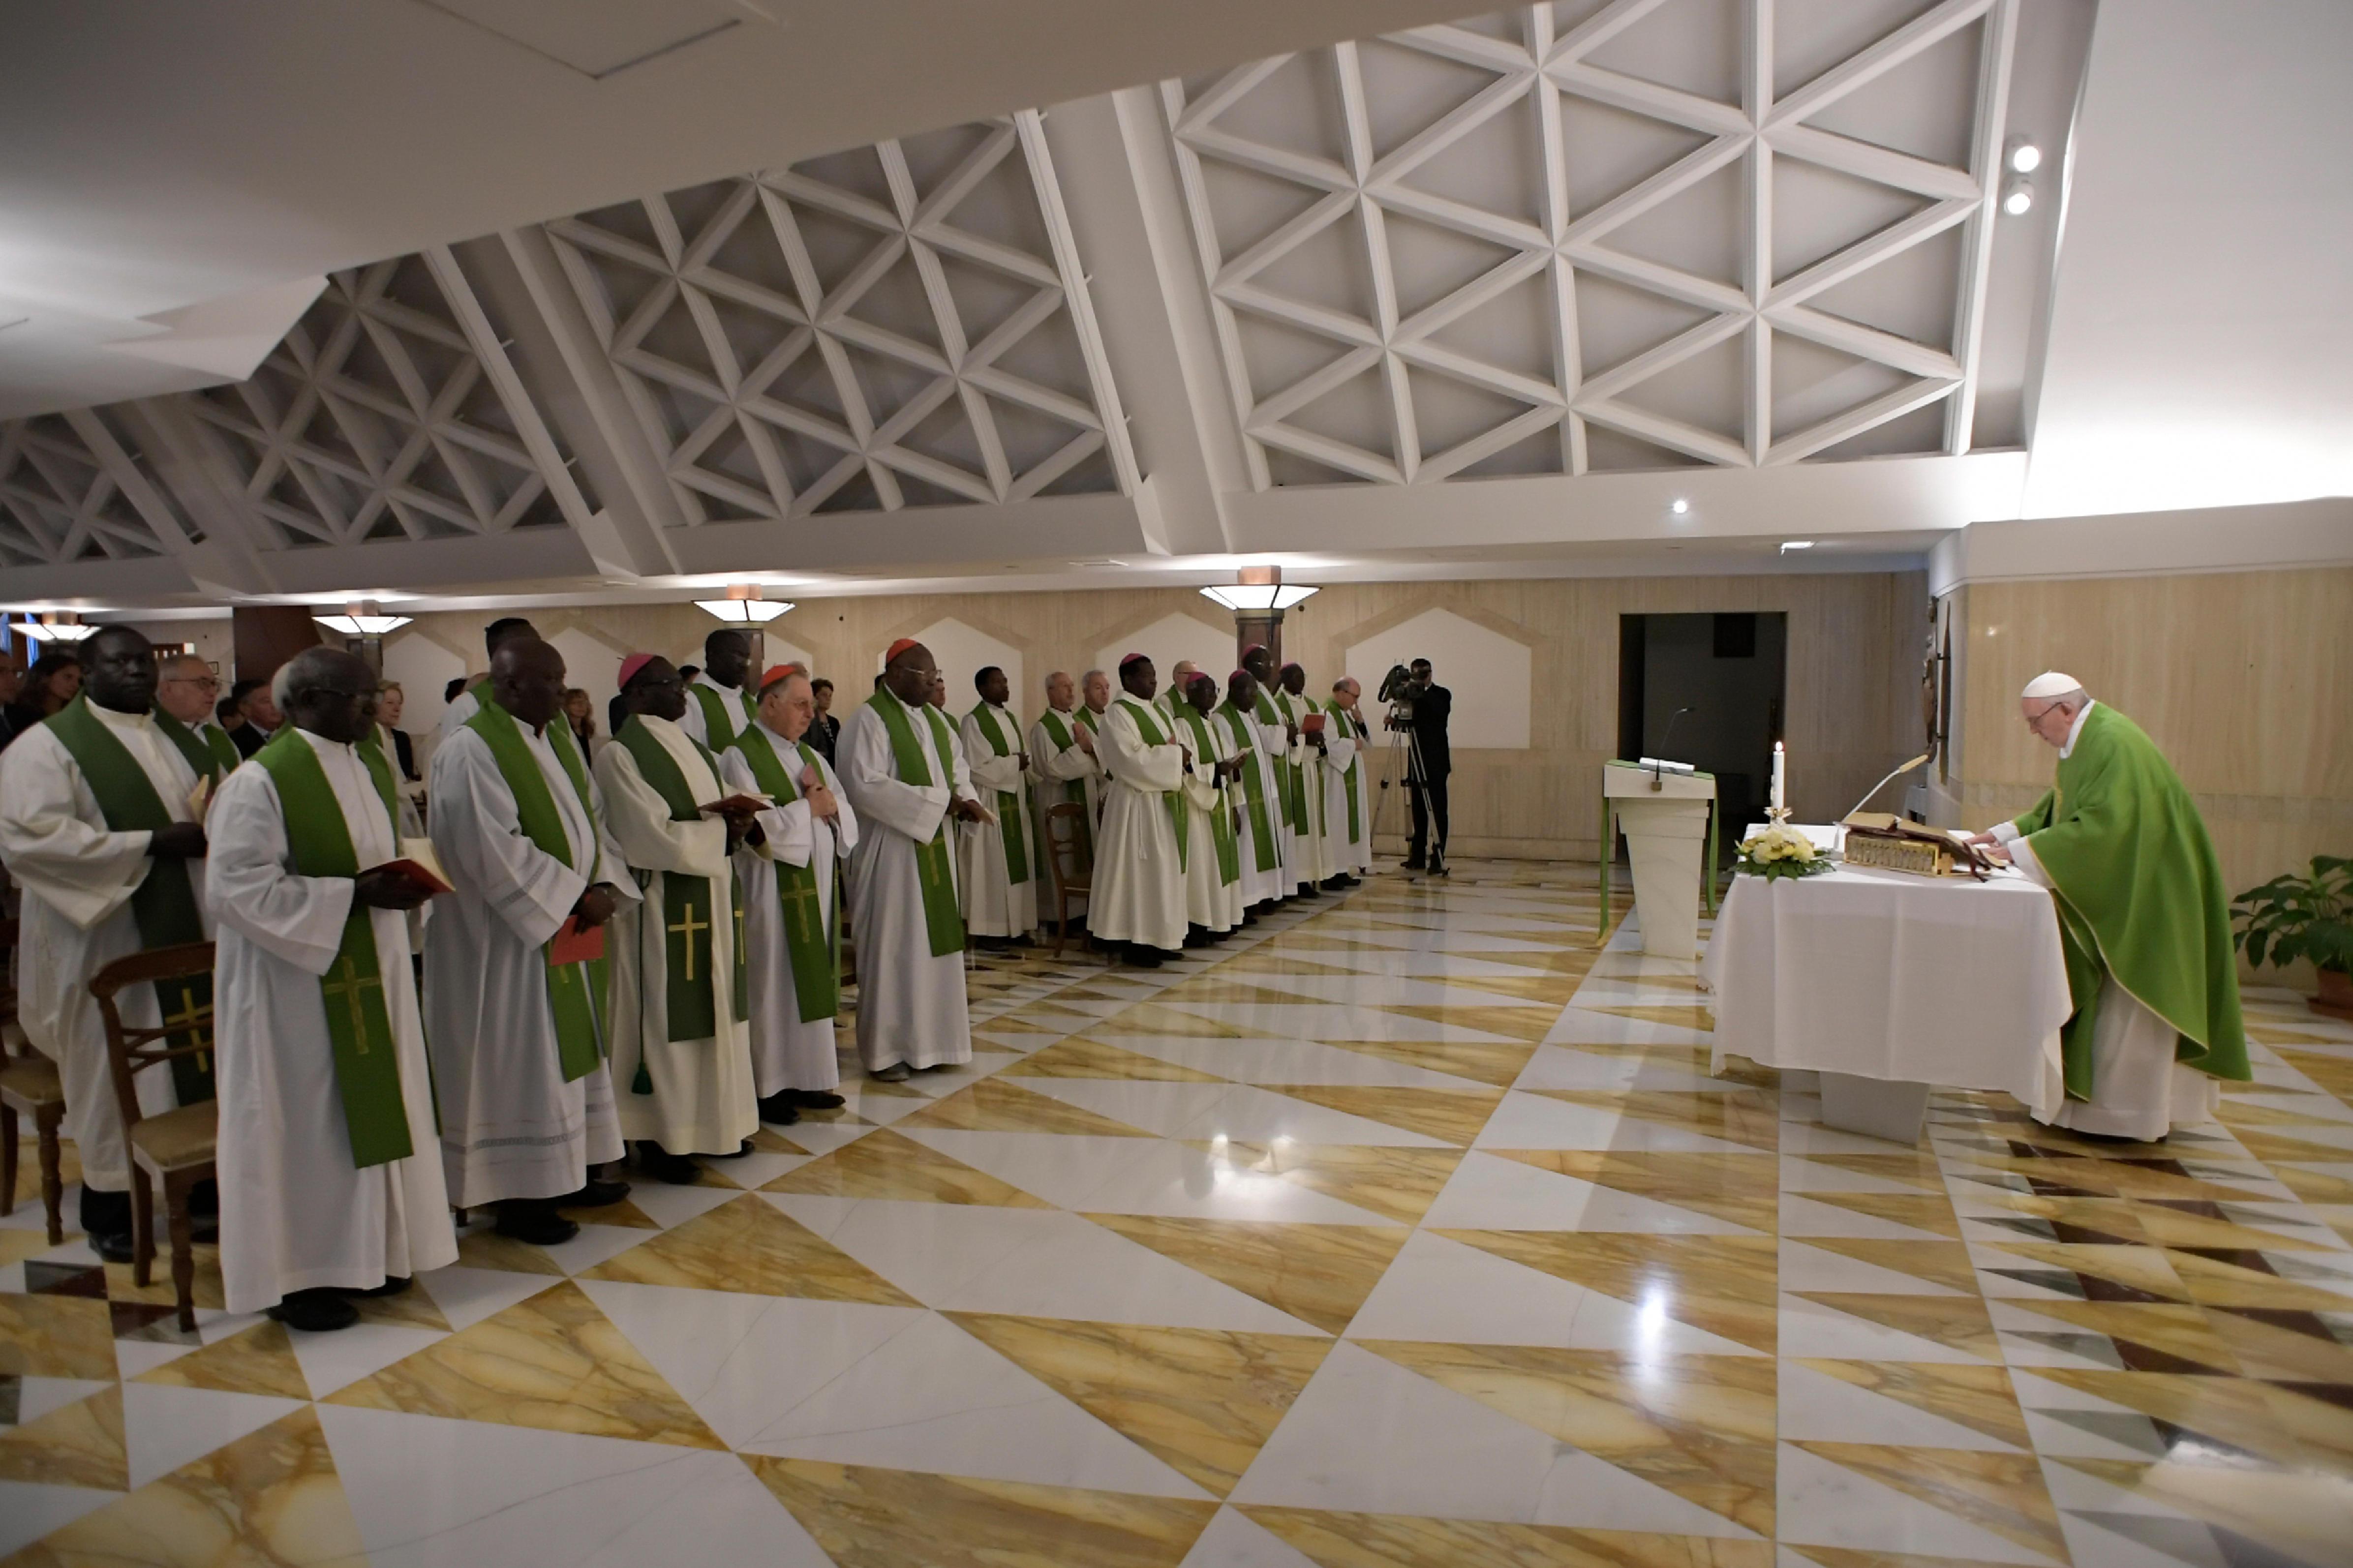 El Papa celebra la Misa en Santa Marta, 4 sept. 2018 © Vatican Media